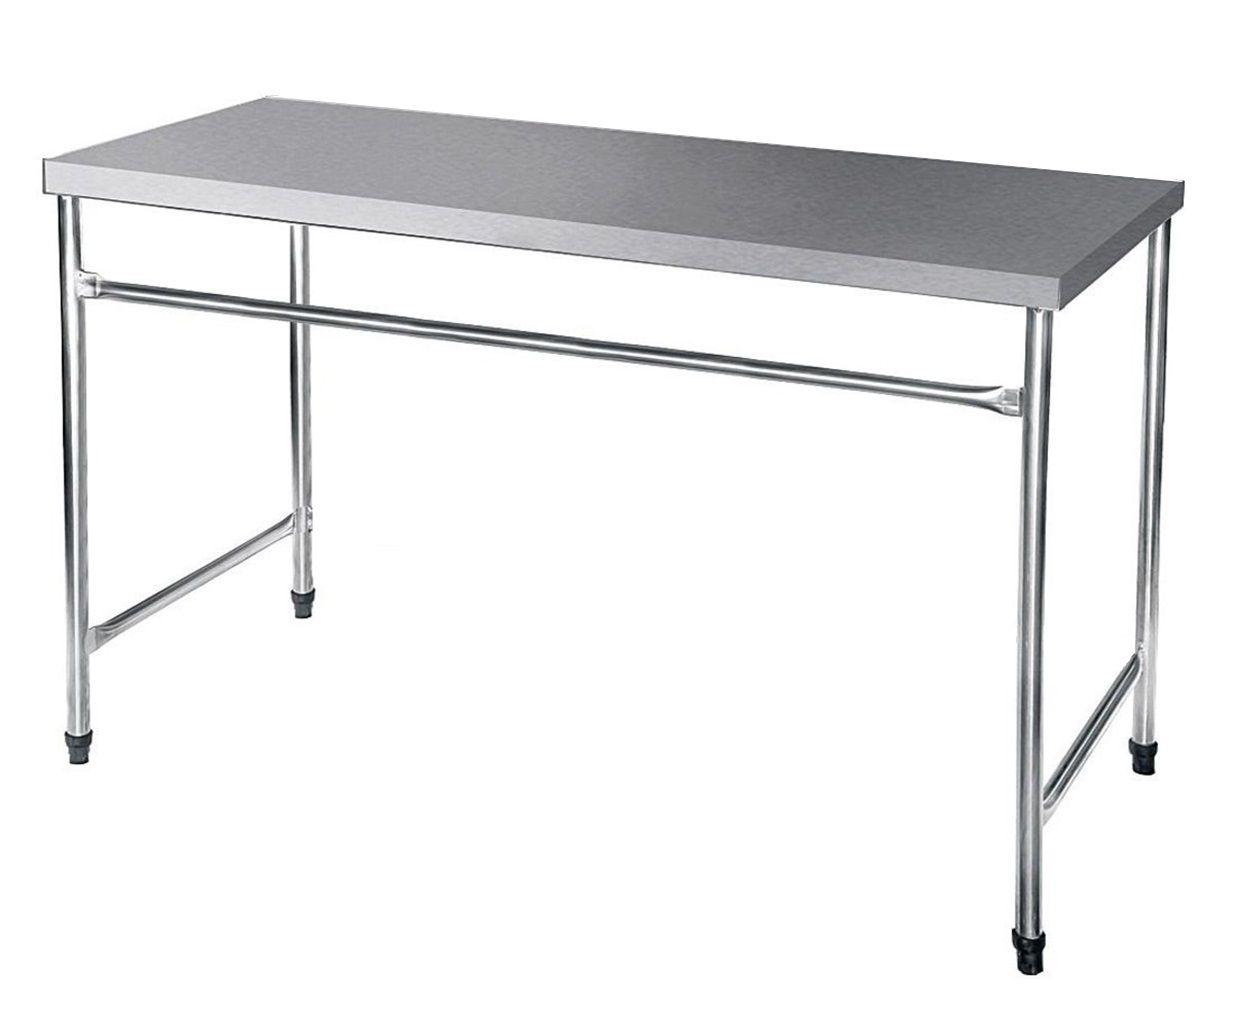 Bancada / Mesa Em Aço Inox (110x70x85)